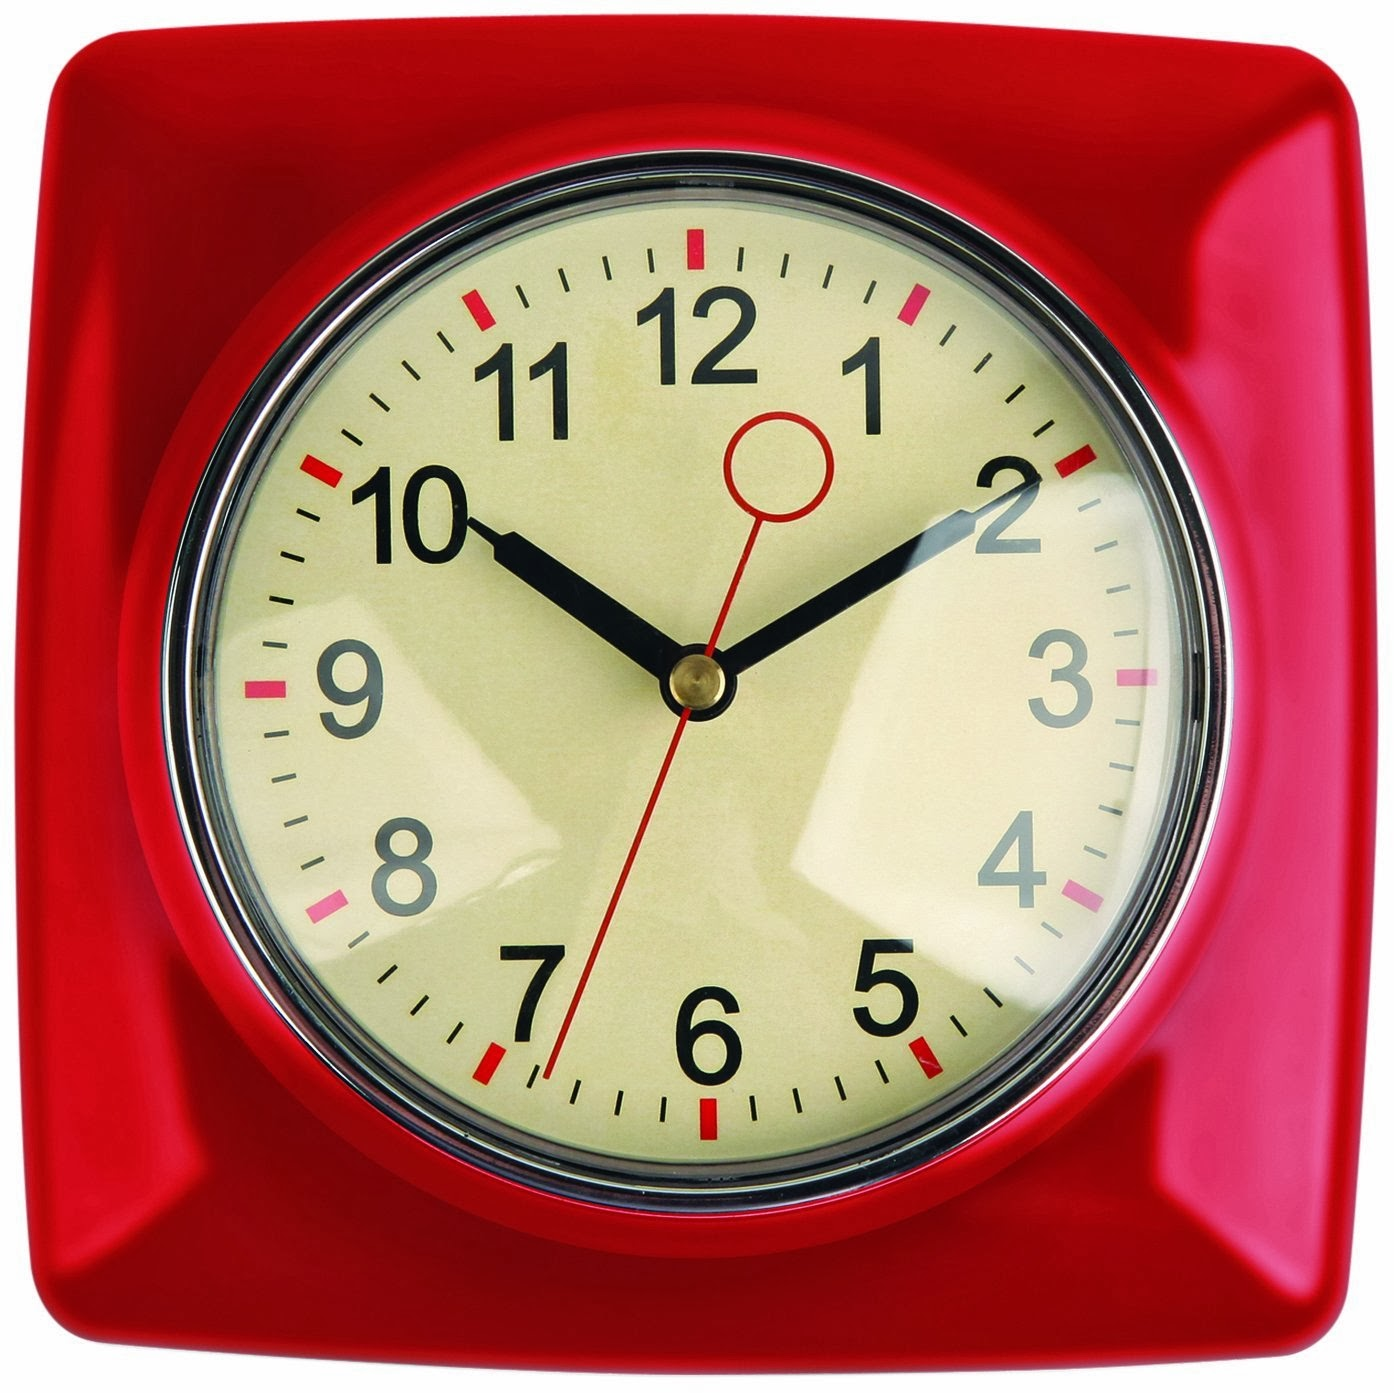 Retro Kitchen Wall Clock Refinished Cabinets Most Beautiful Clocks Shopping